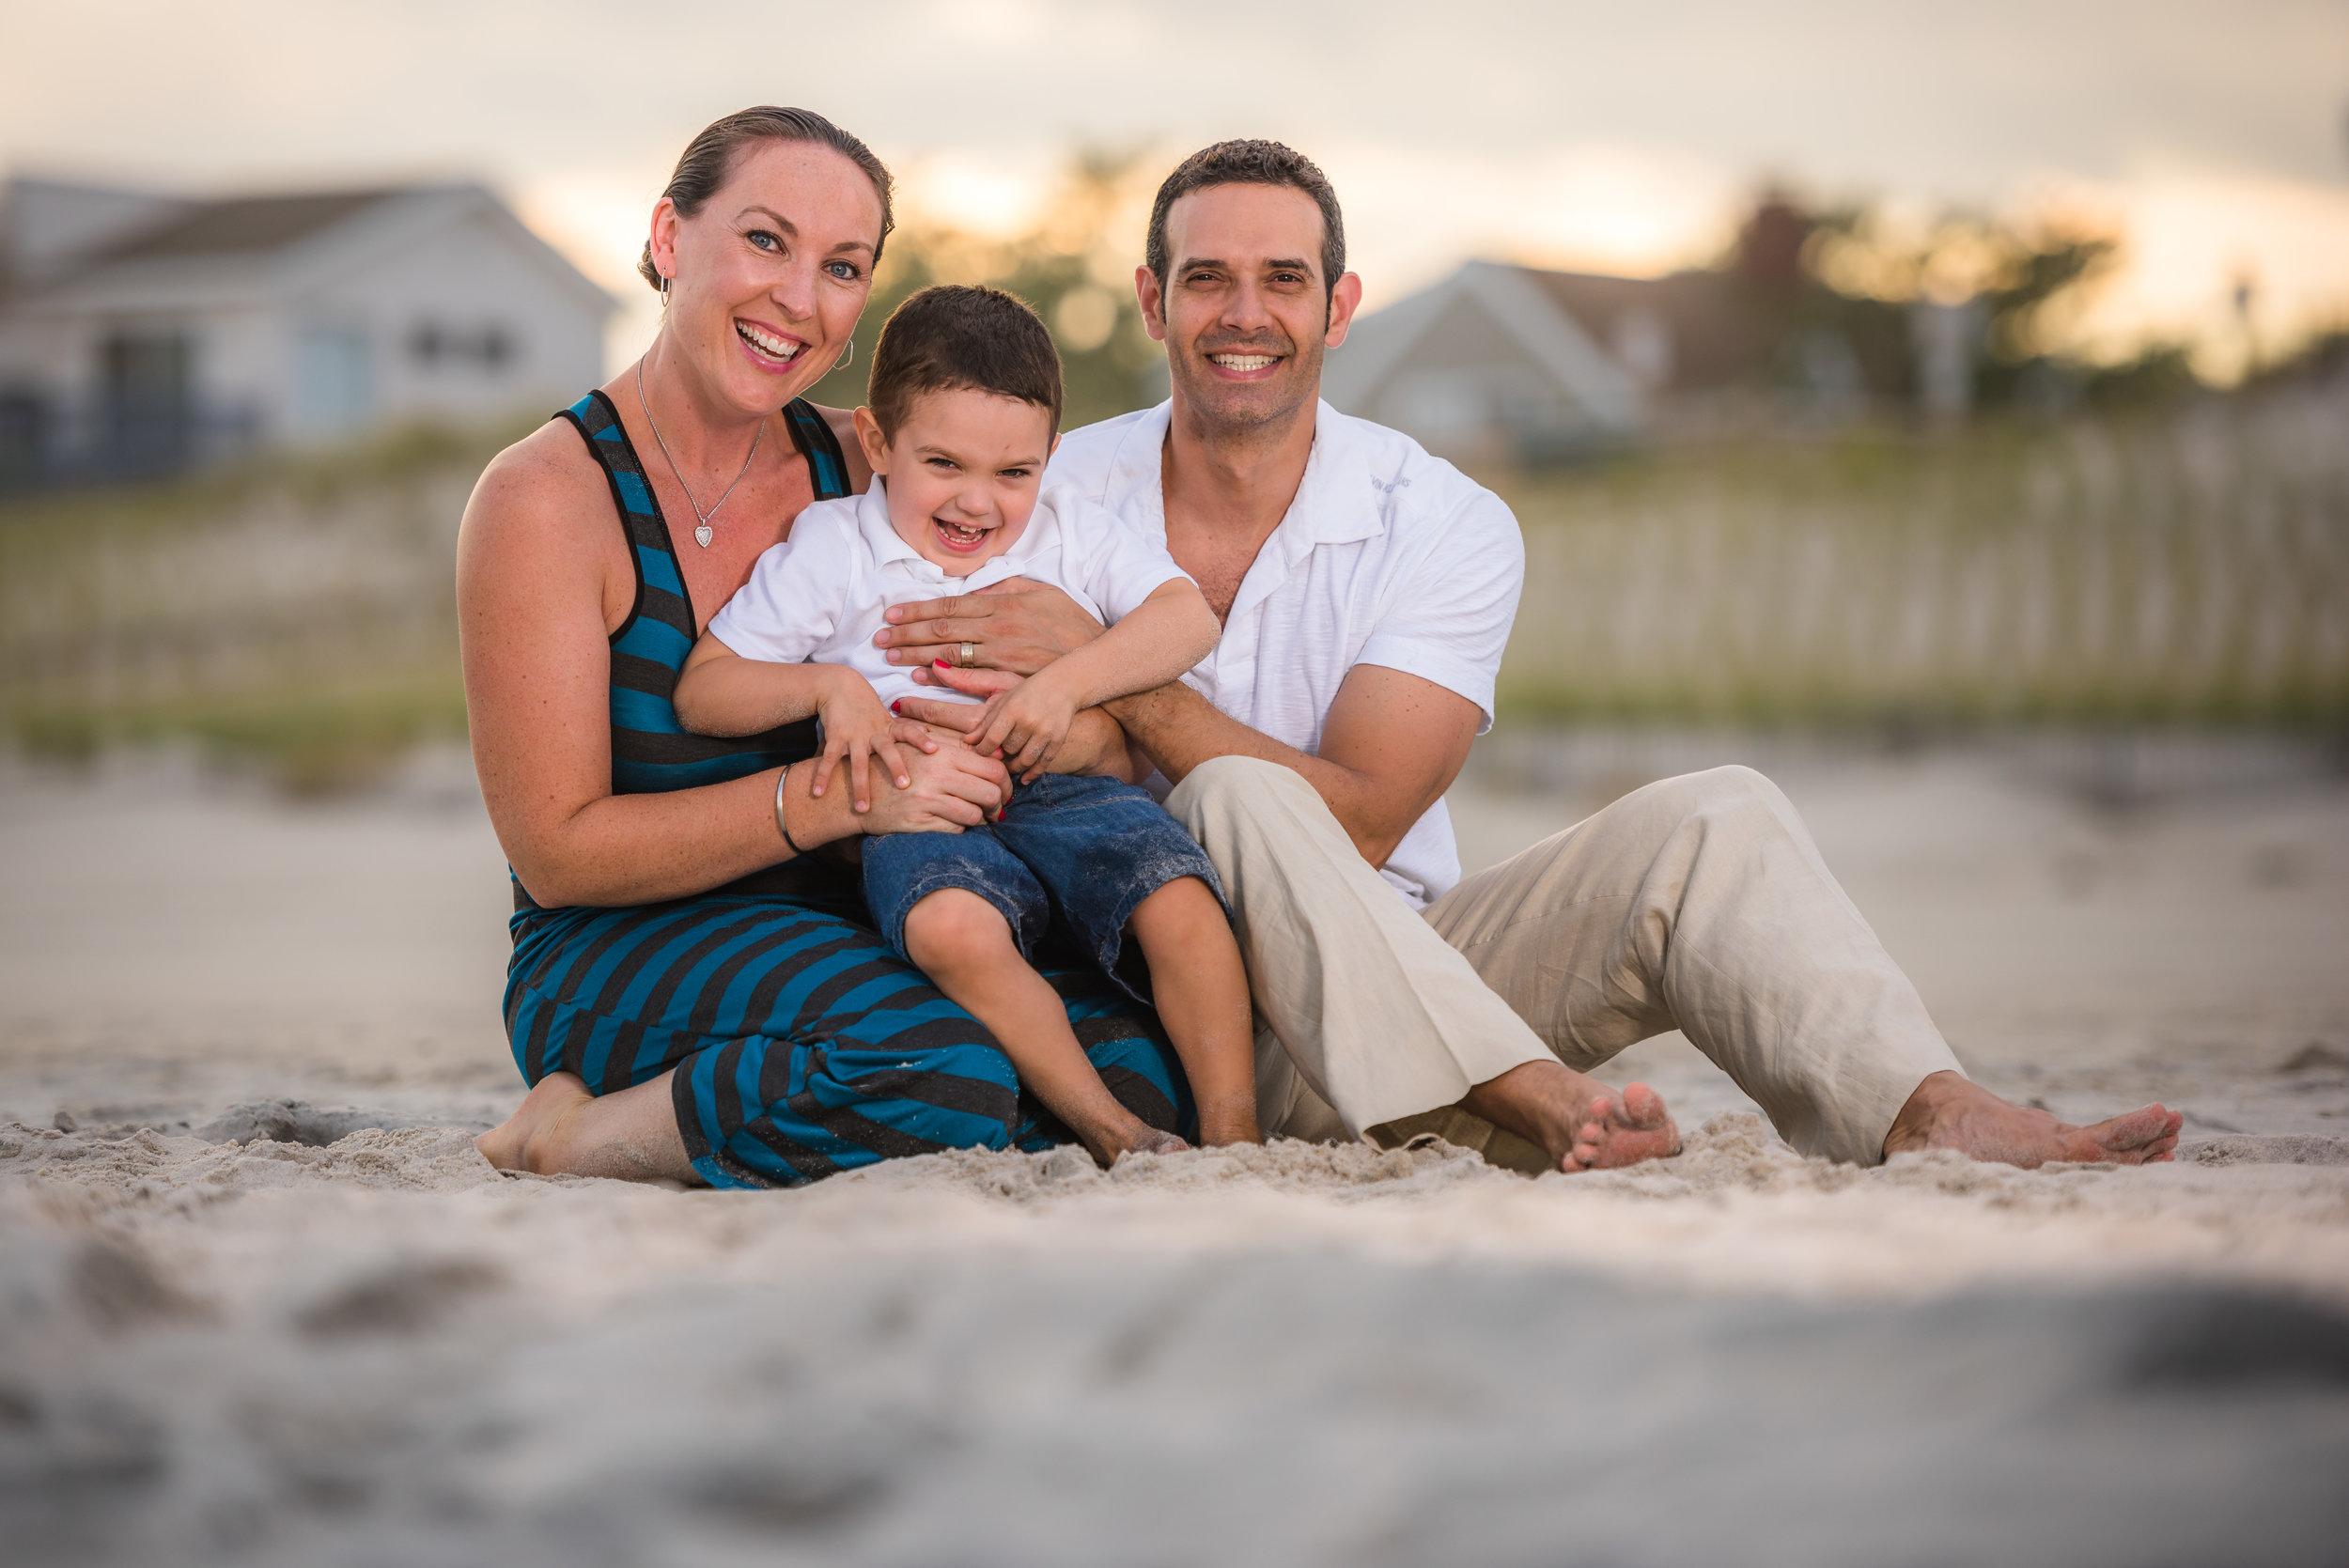 Long Beach Island Family Portraits | Adinda, Greg & James 10